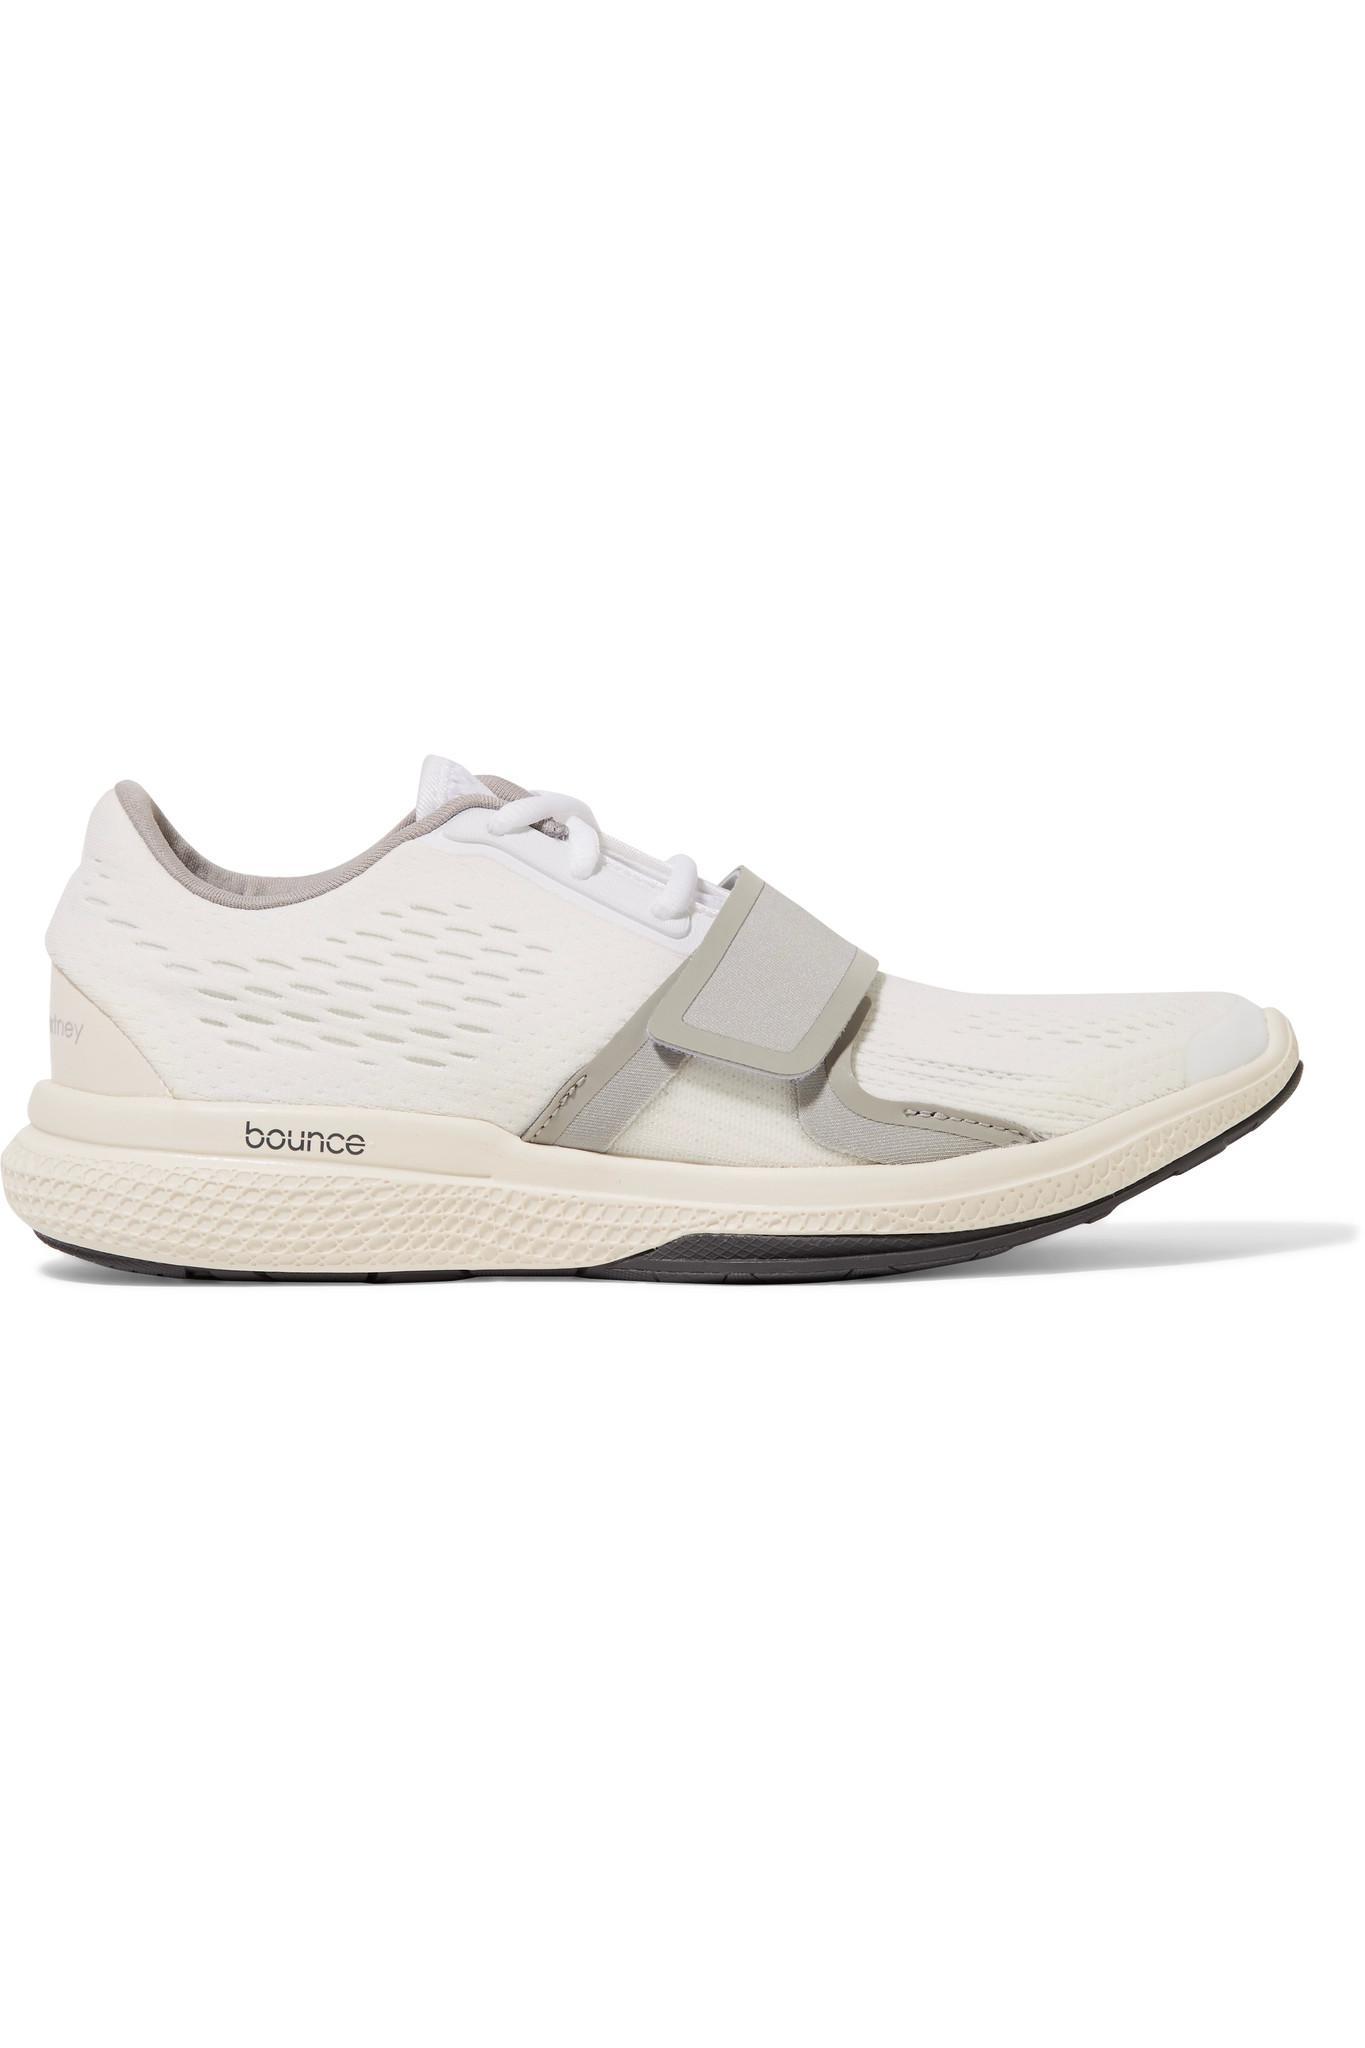 8be61fdcd3c9e Lyst - adidas By Stella McCartney Atani Bounce Stretch-mesh Sneakers ...